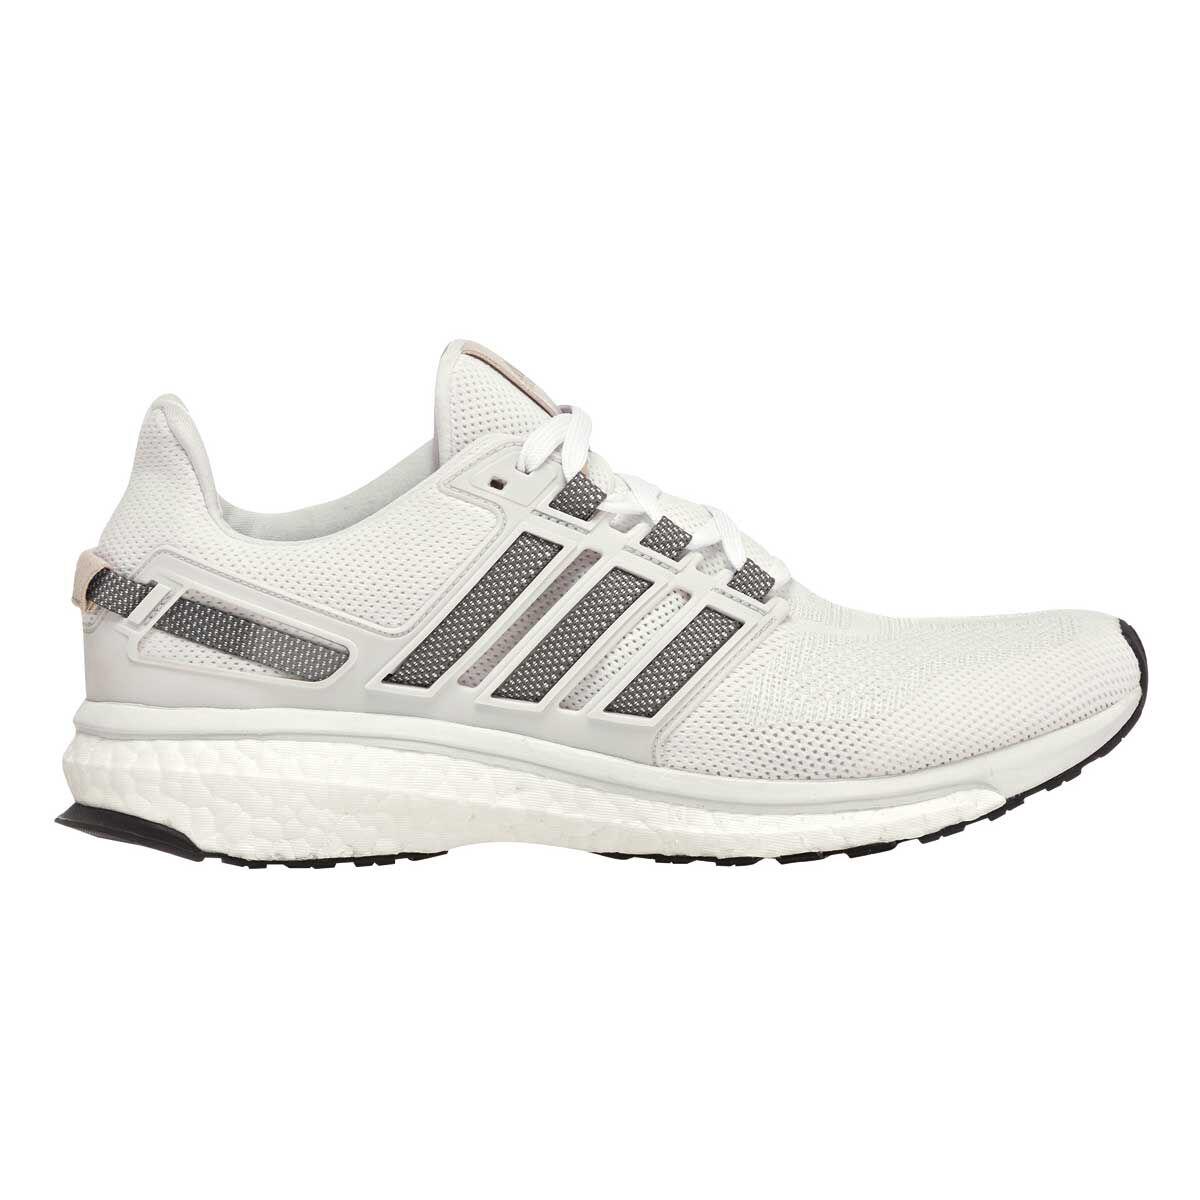 adidas energia impulso 3 donne scarpe bianco / grigio noi 9 ribelle